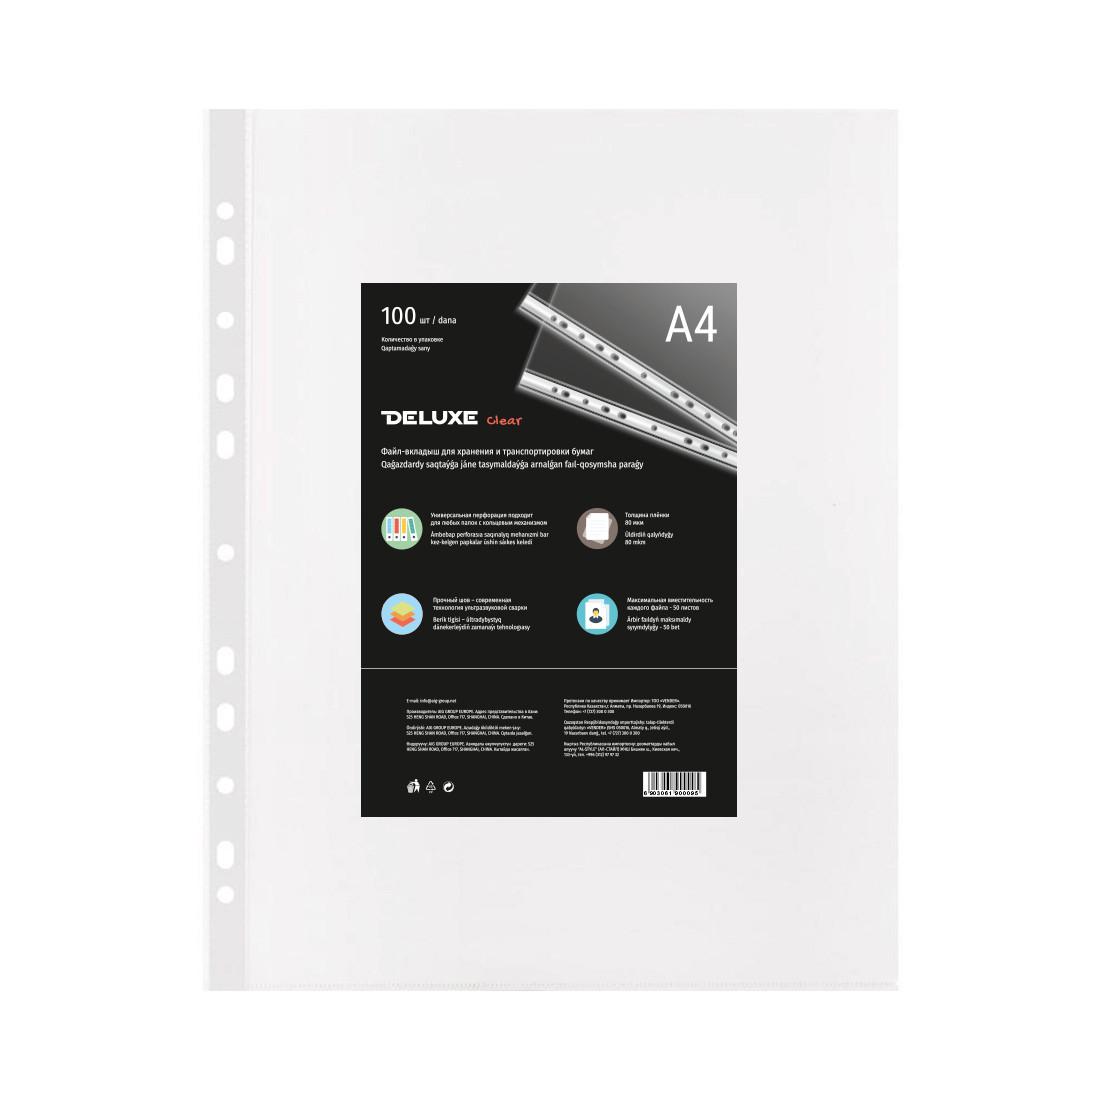 Файл-вкладыш пластиковый Deluxe Clear A480M (A4, Прозрачный, 100 шт)